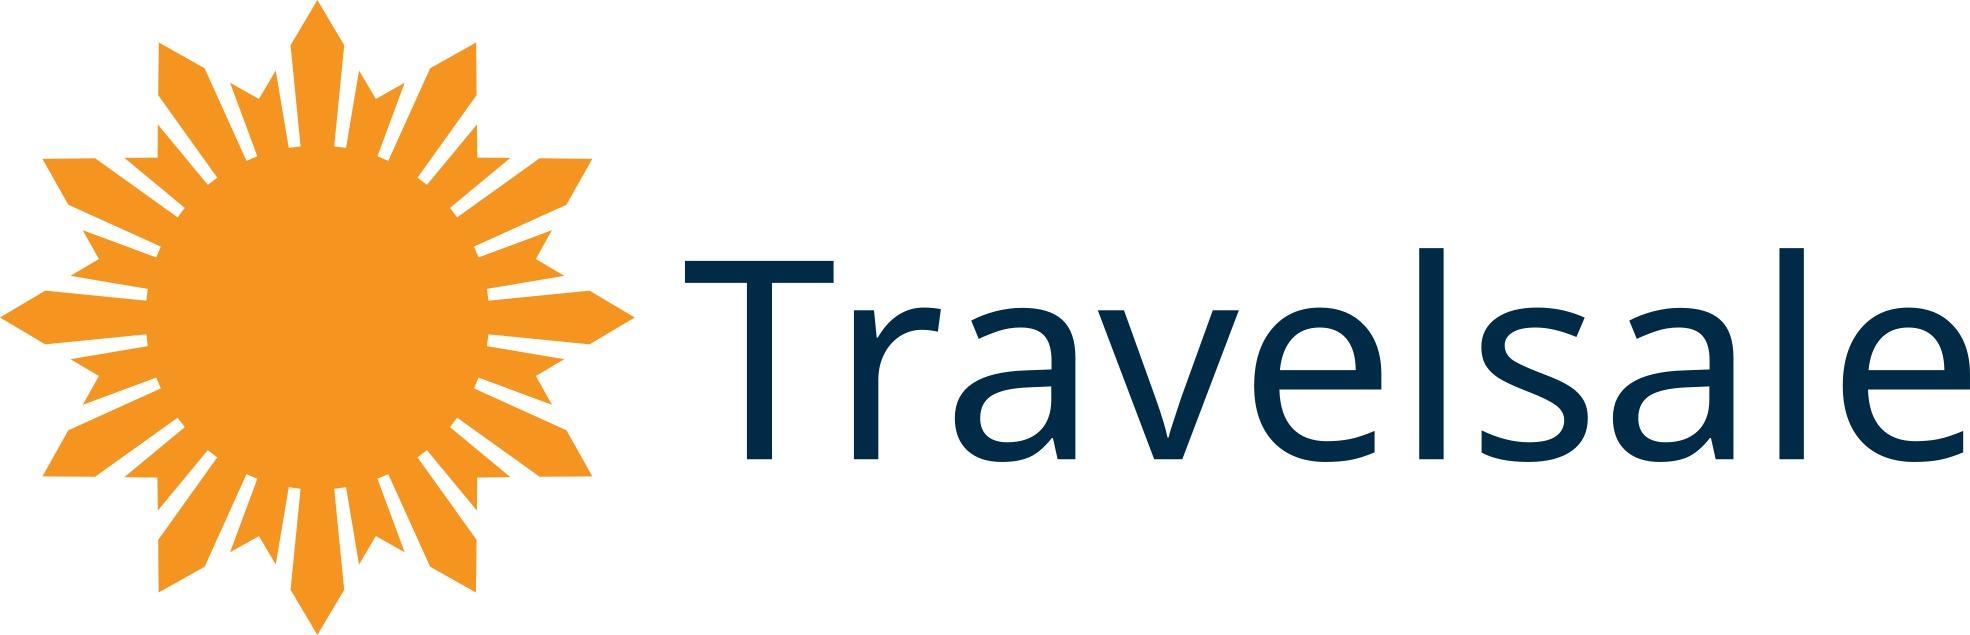 Travelsale